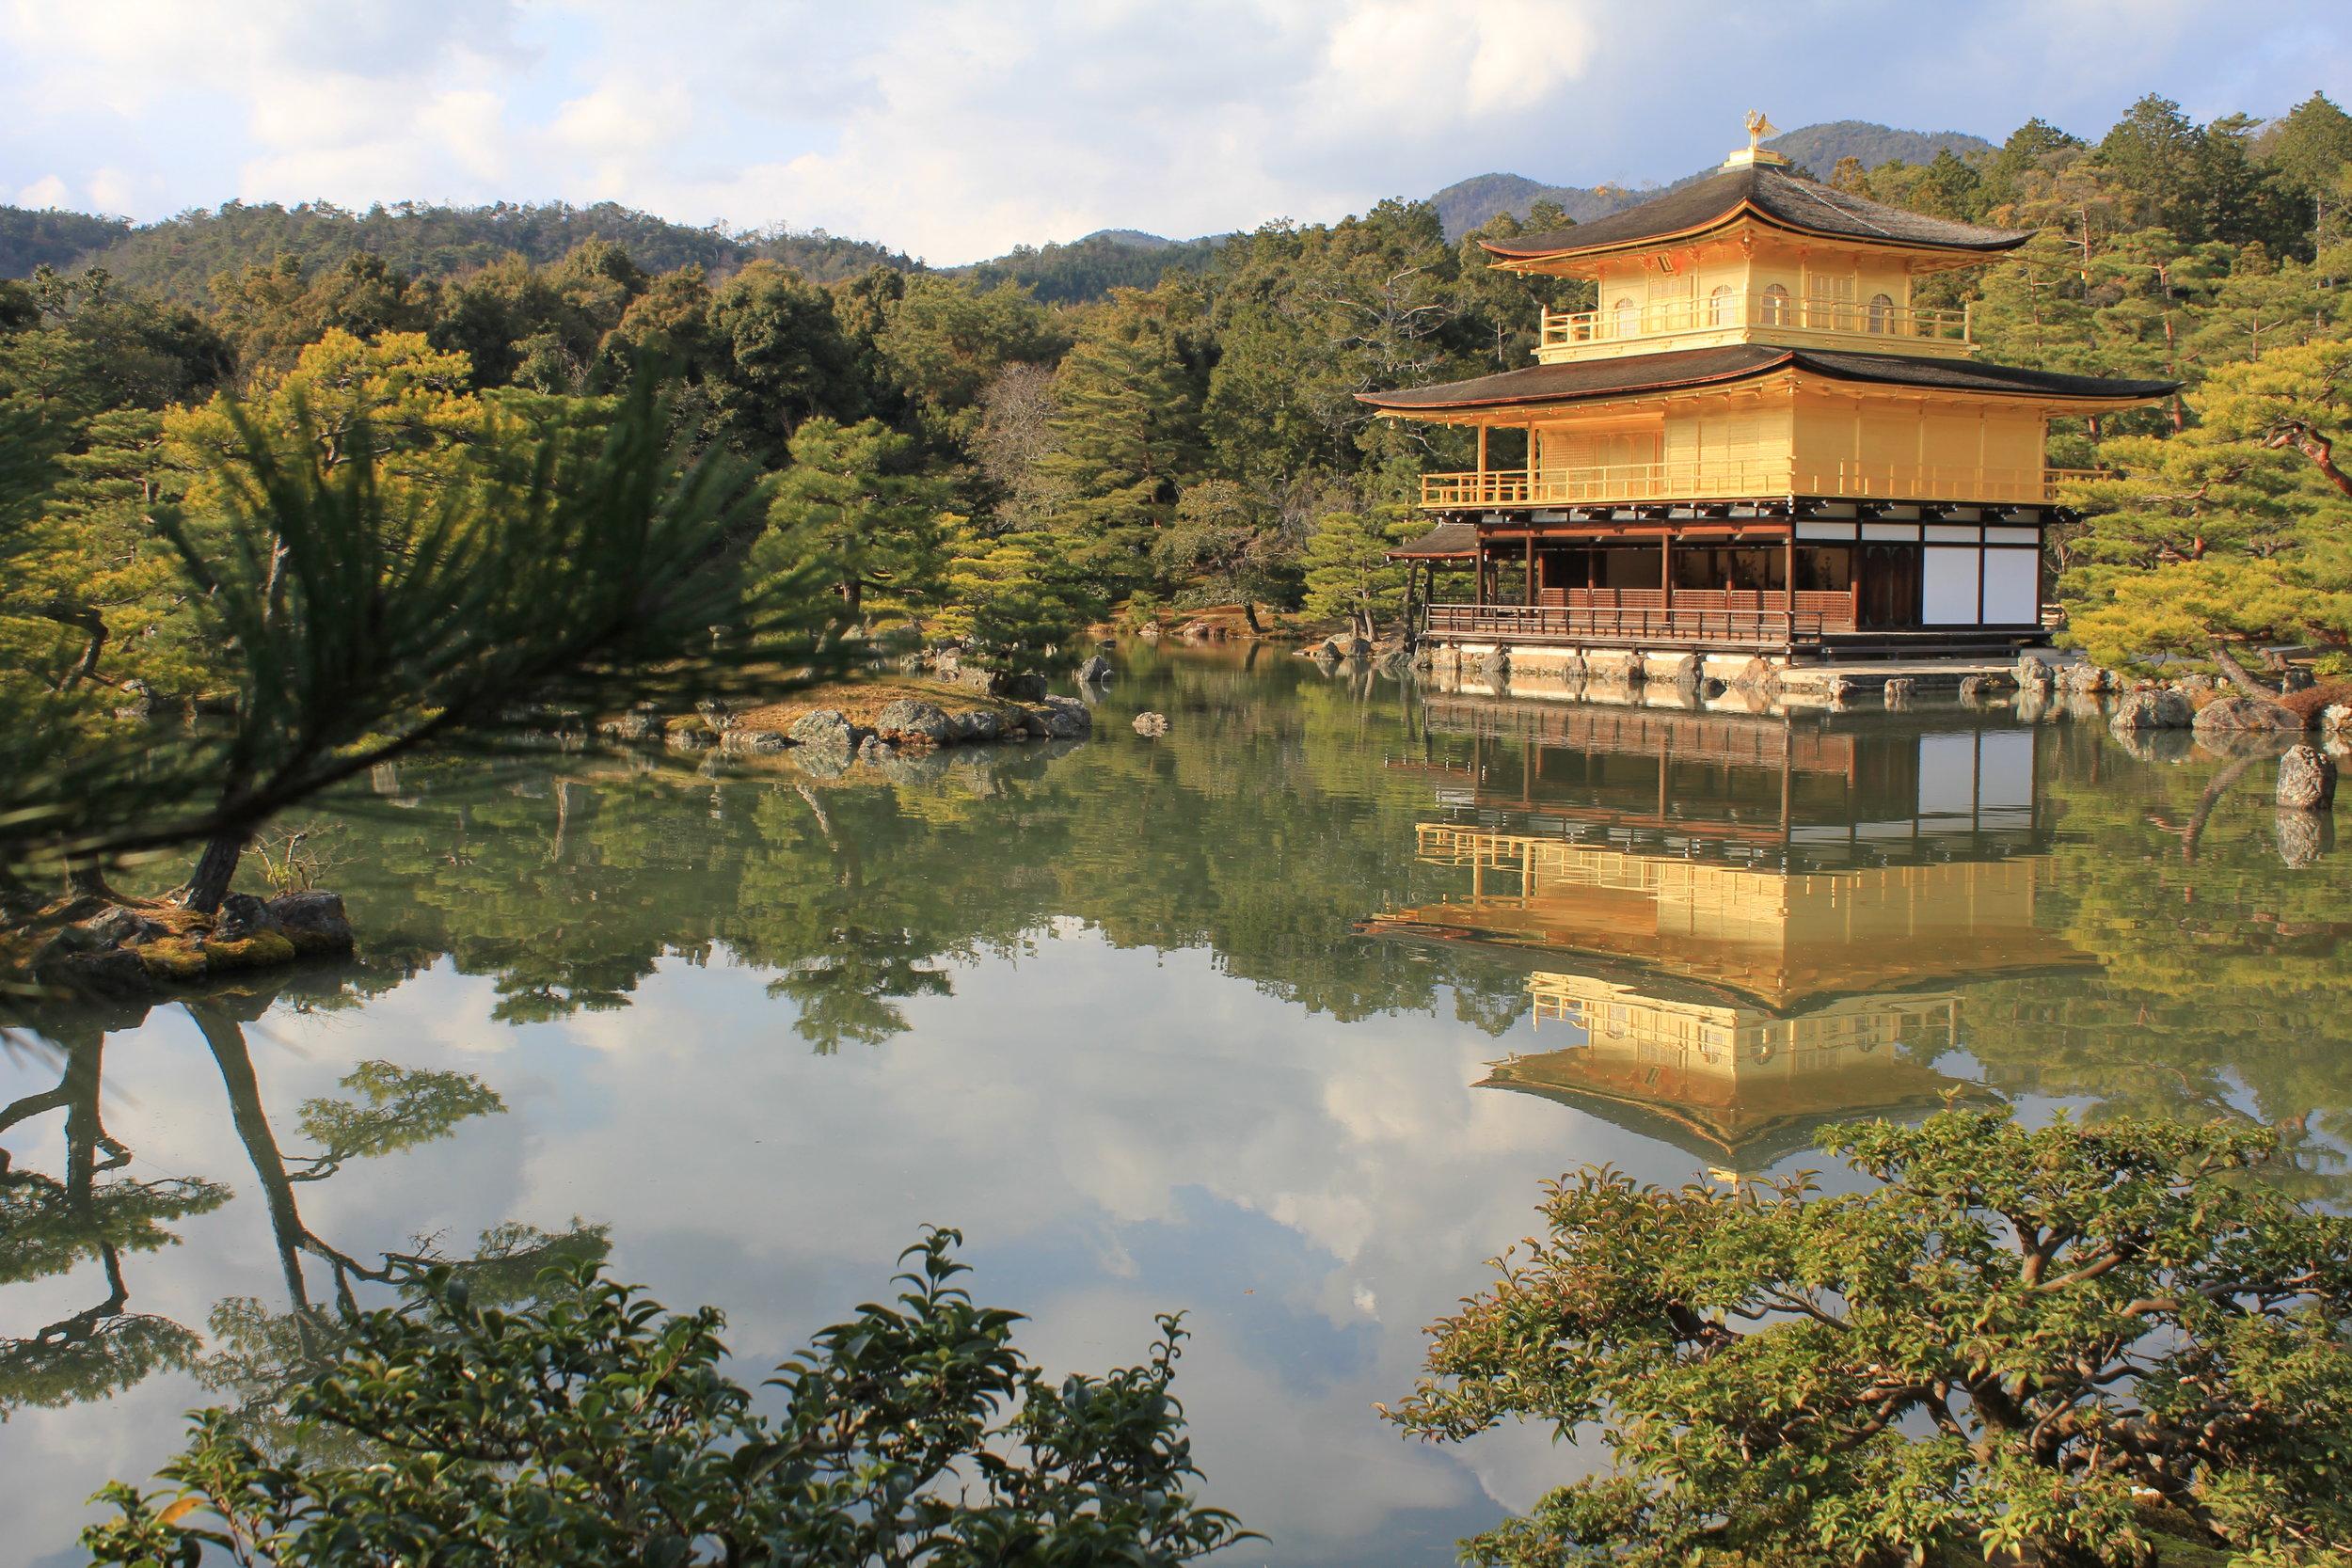 The glorious Kinkaku-ji (Golden Pavilion) in Kyoto, Japan